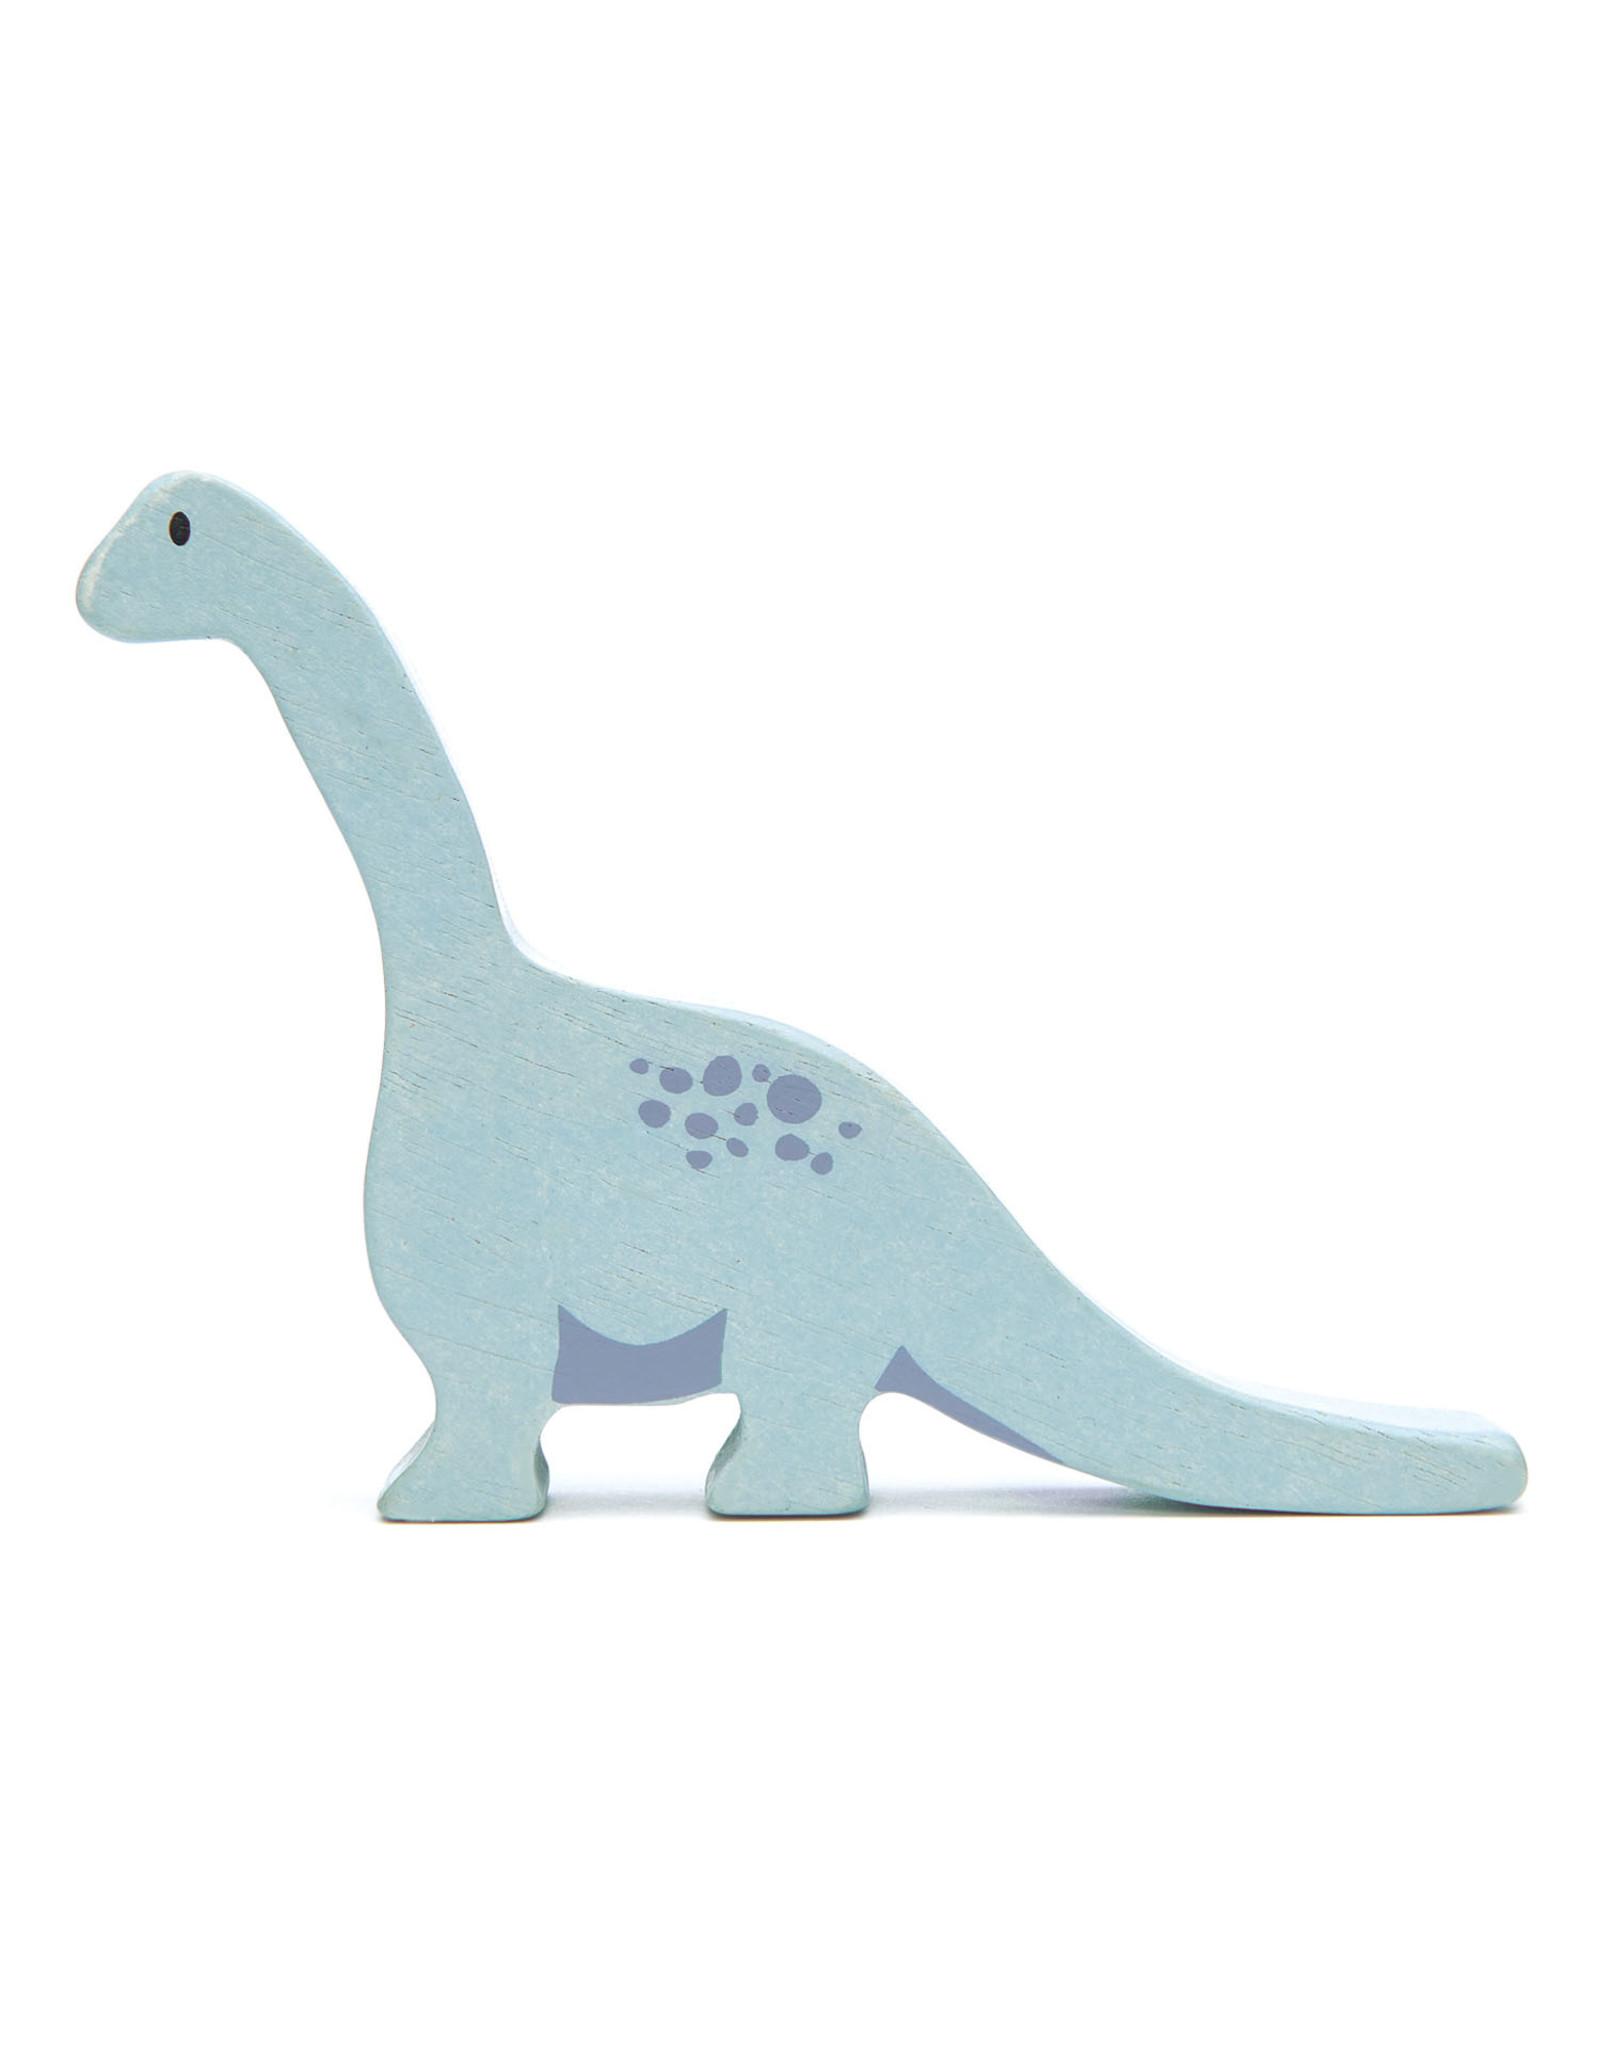 Tender Leaf Toys Dinosaurs - Brontosaurus